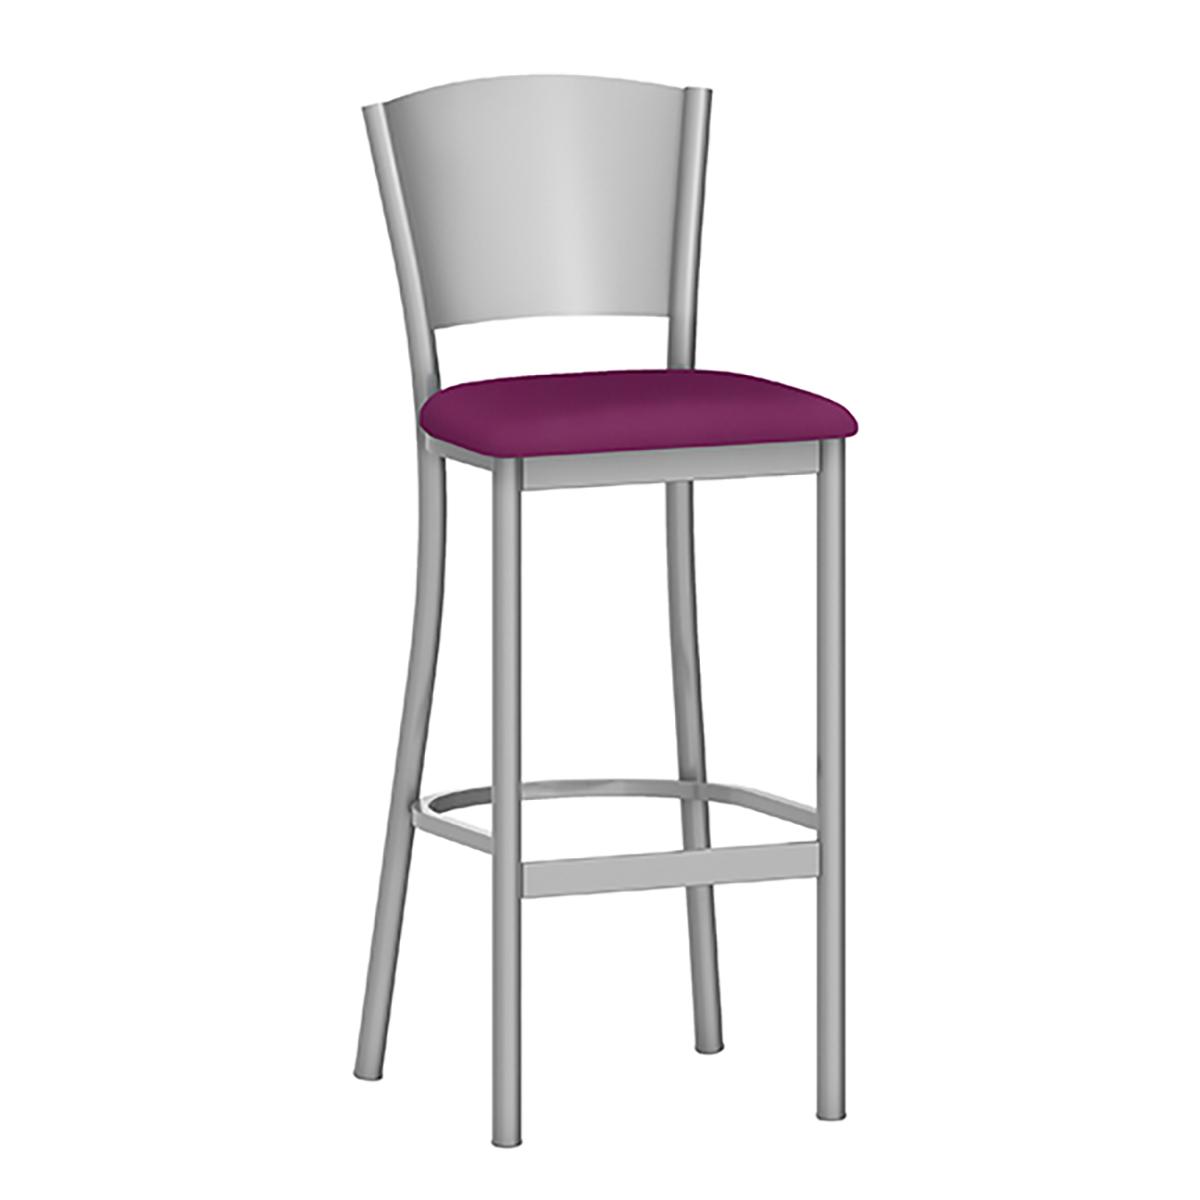 metal barstool with upholstery